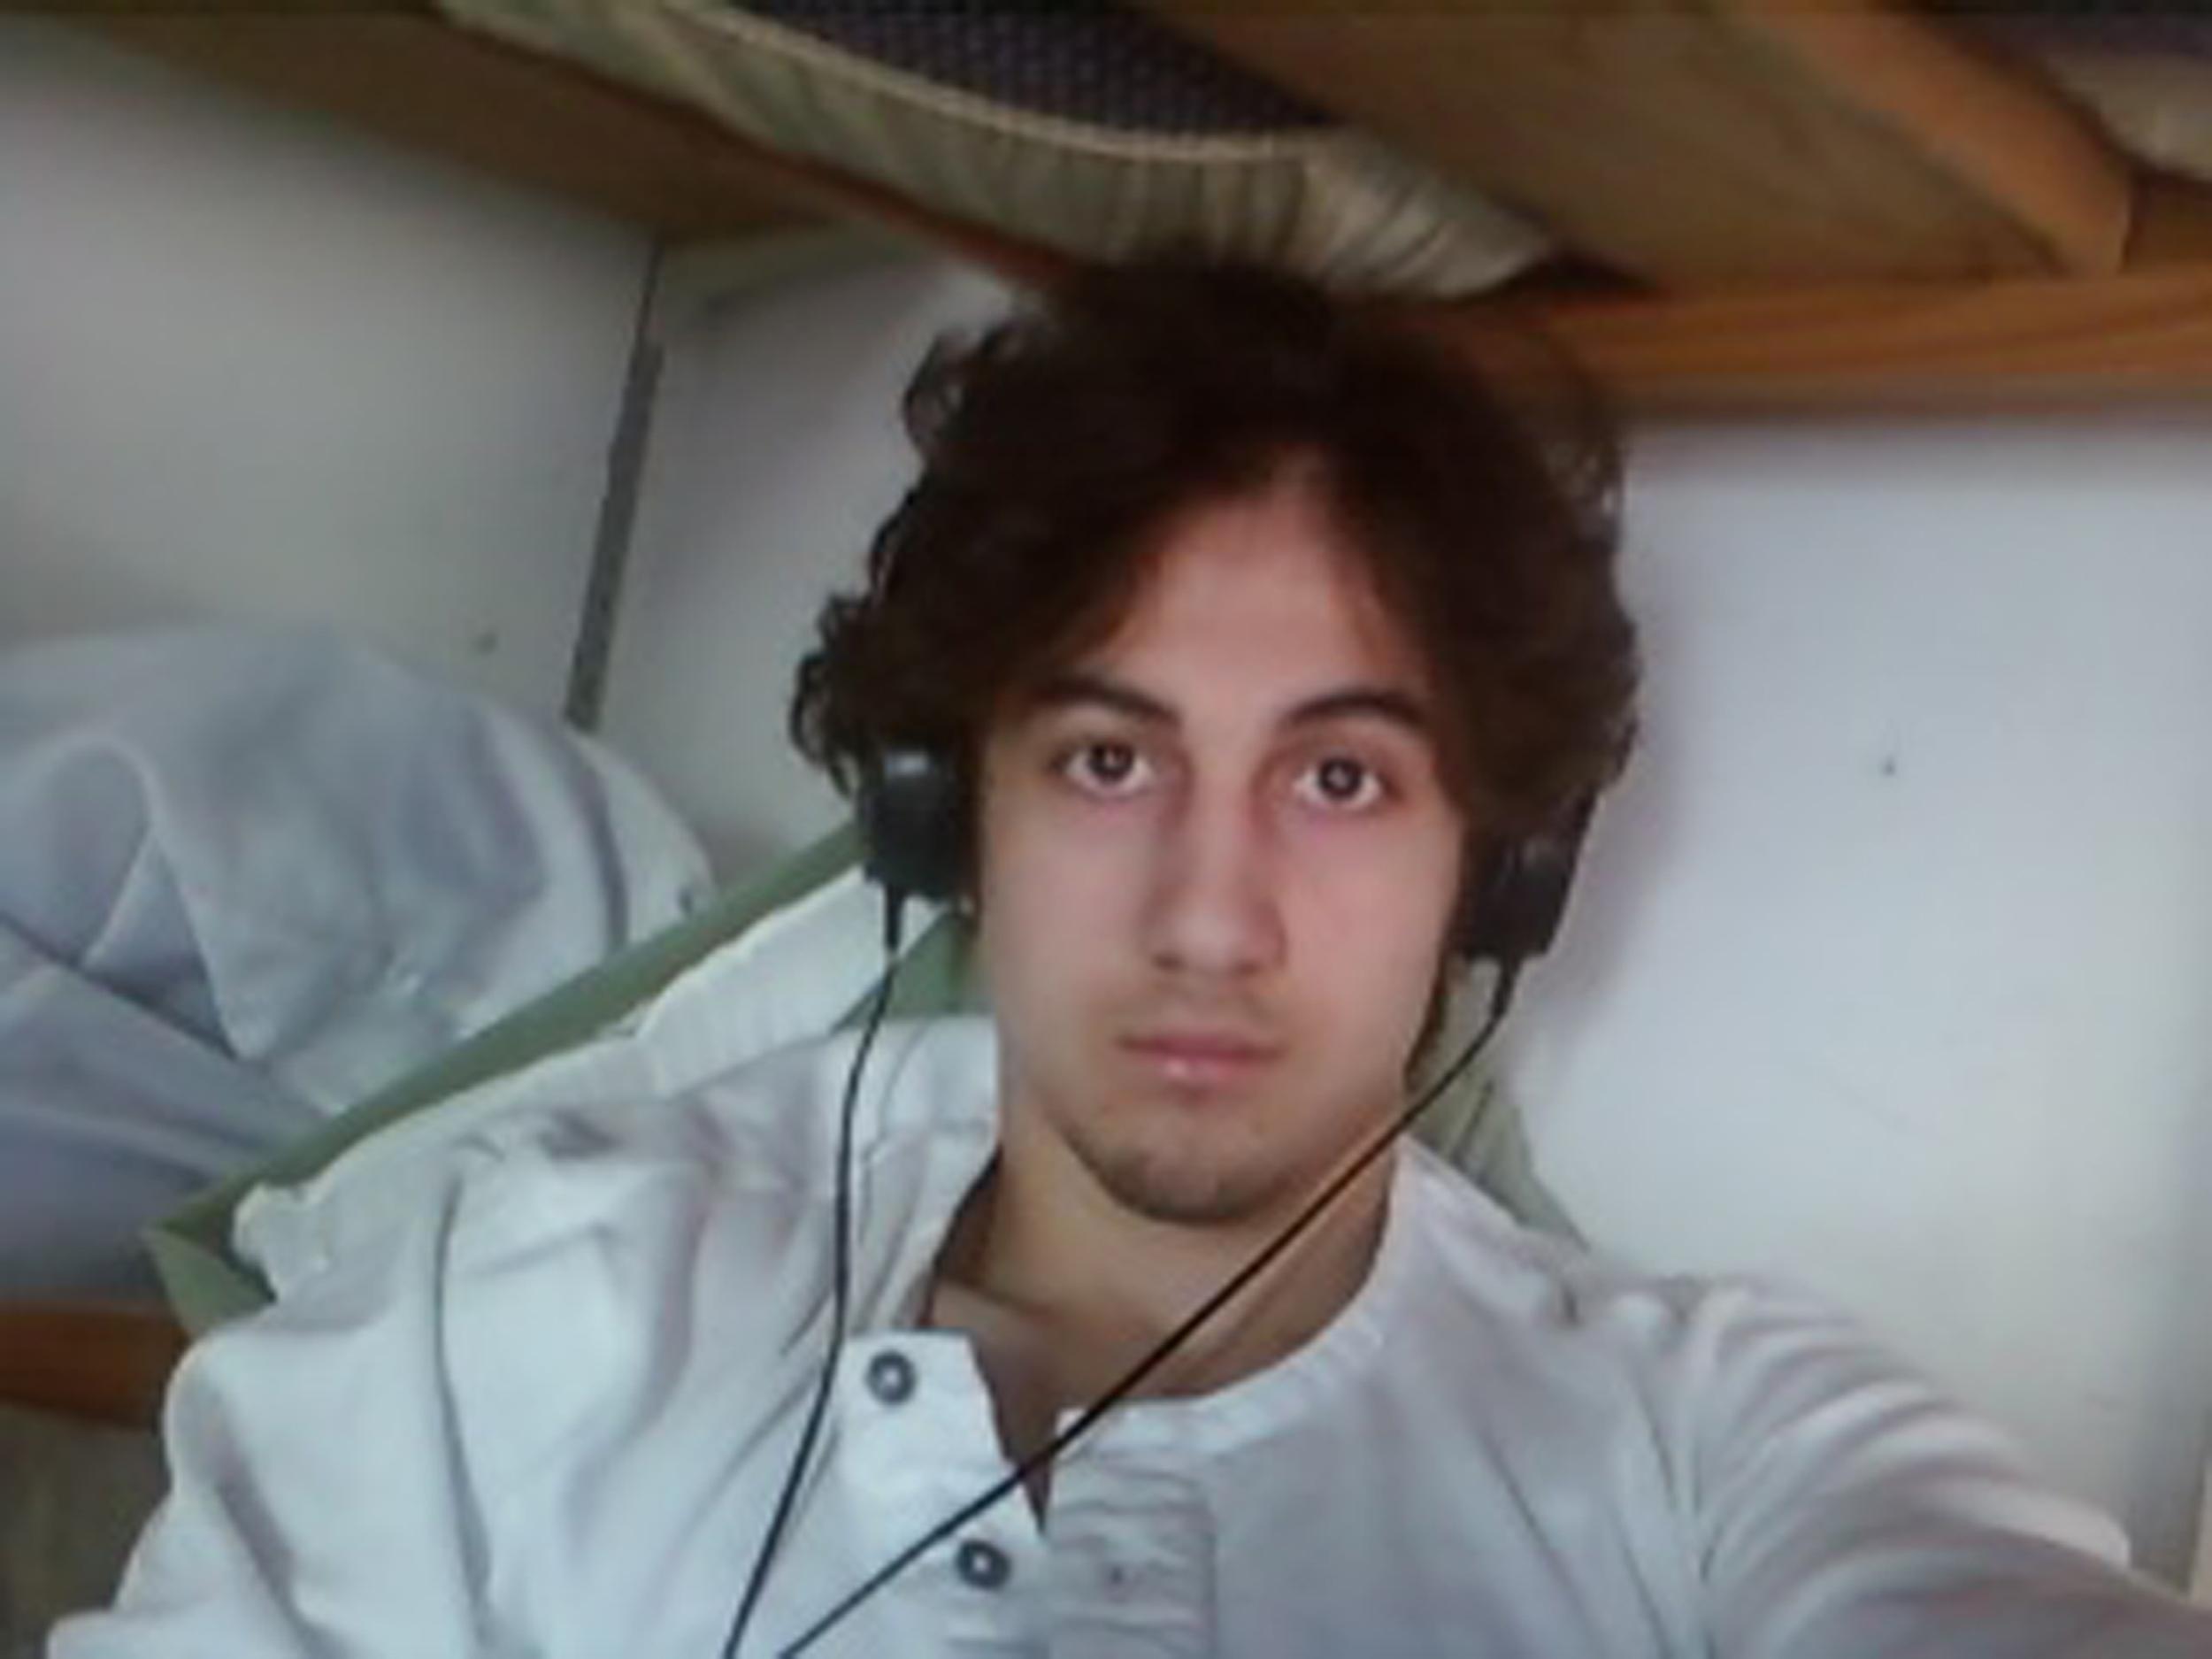 Marathon bomber's lawyers have Dec. court date to appeal death sentence